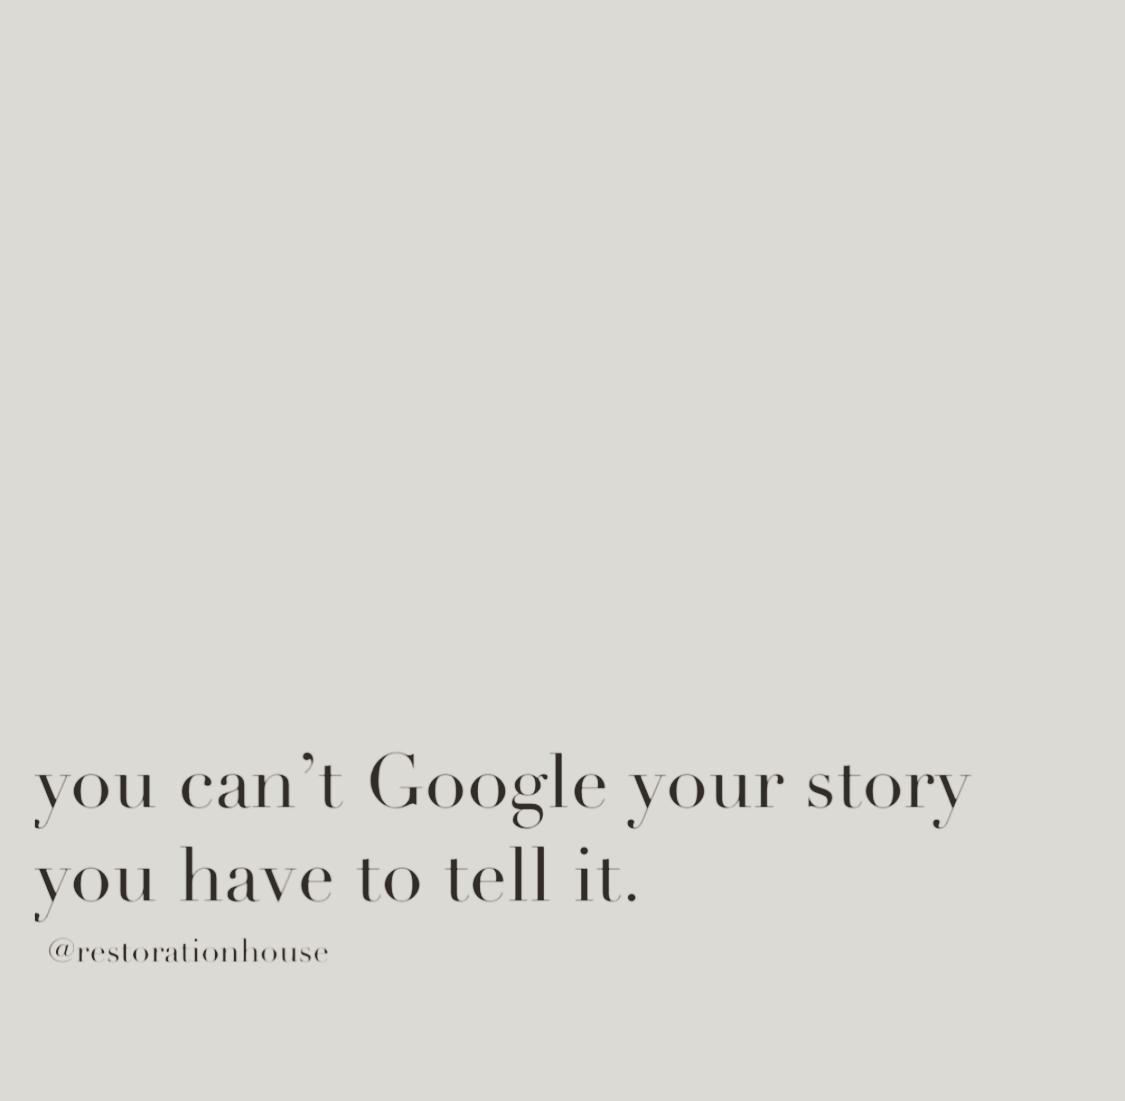 google_story.jpg